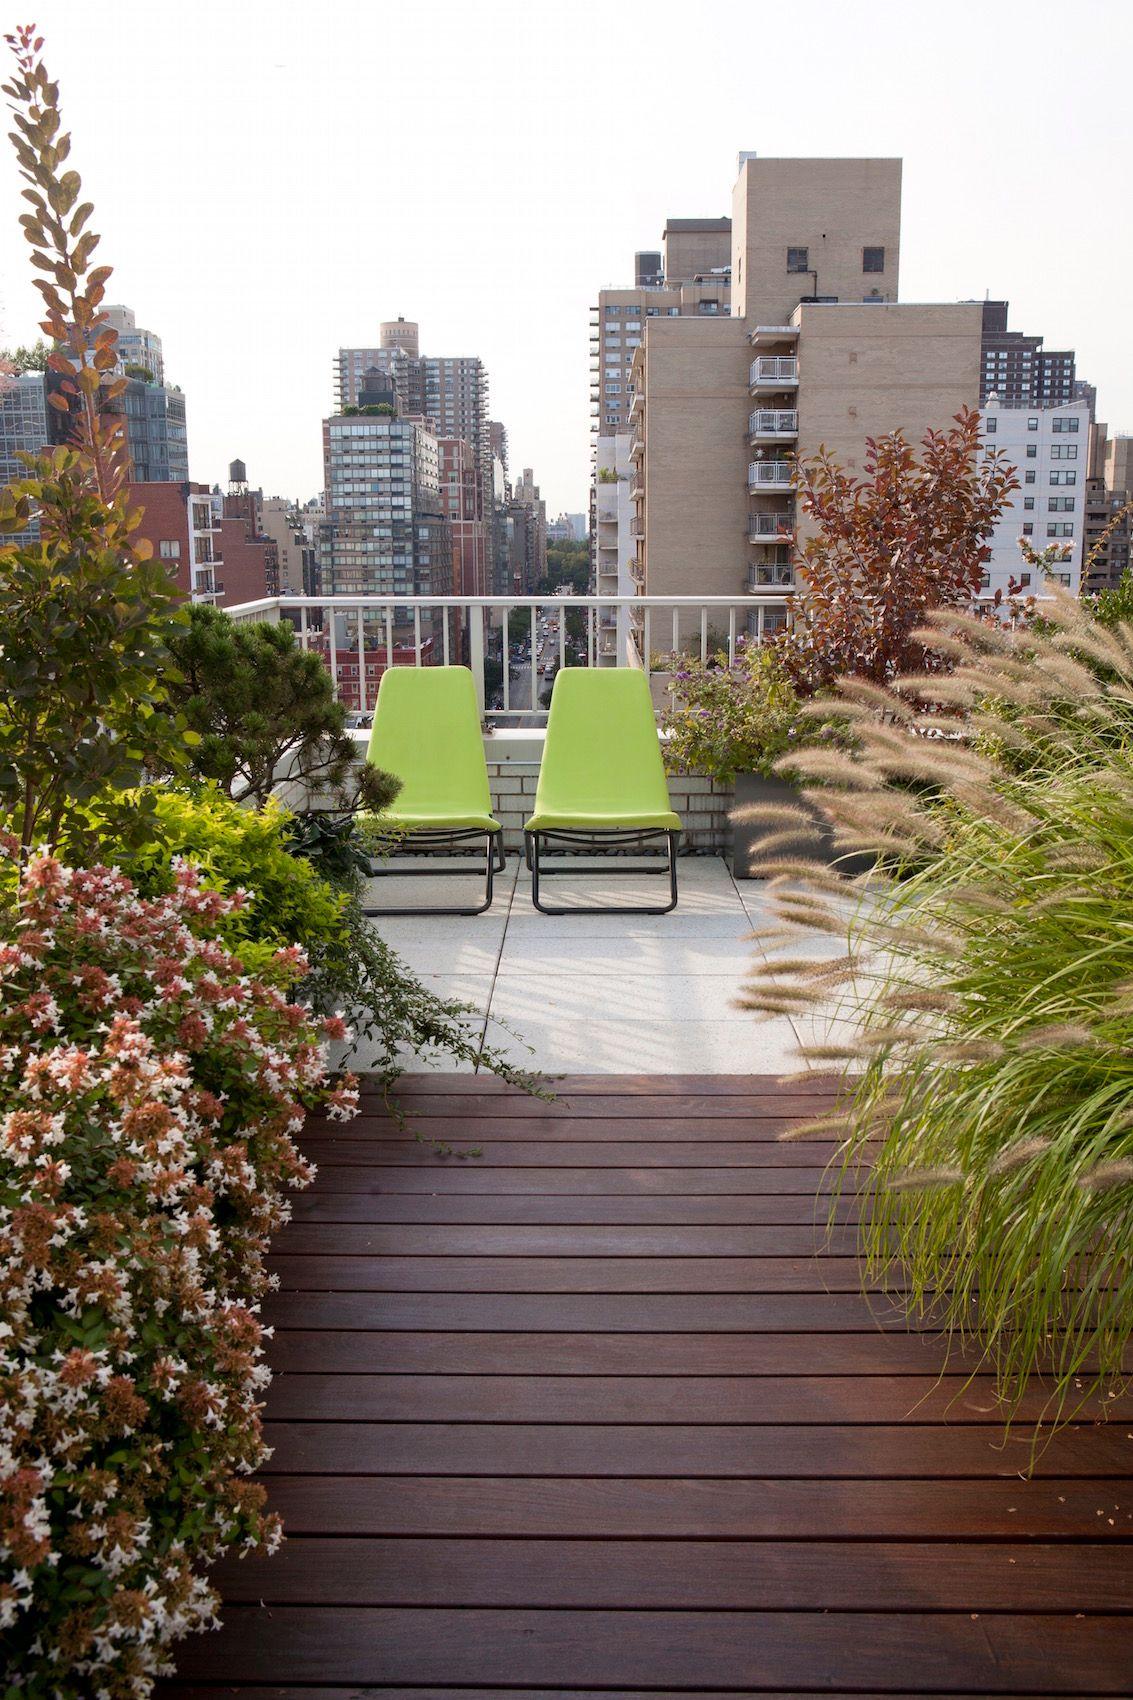 Upper East Side Roofgarden